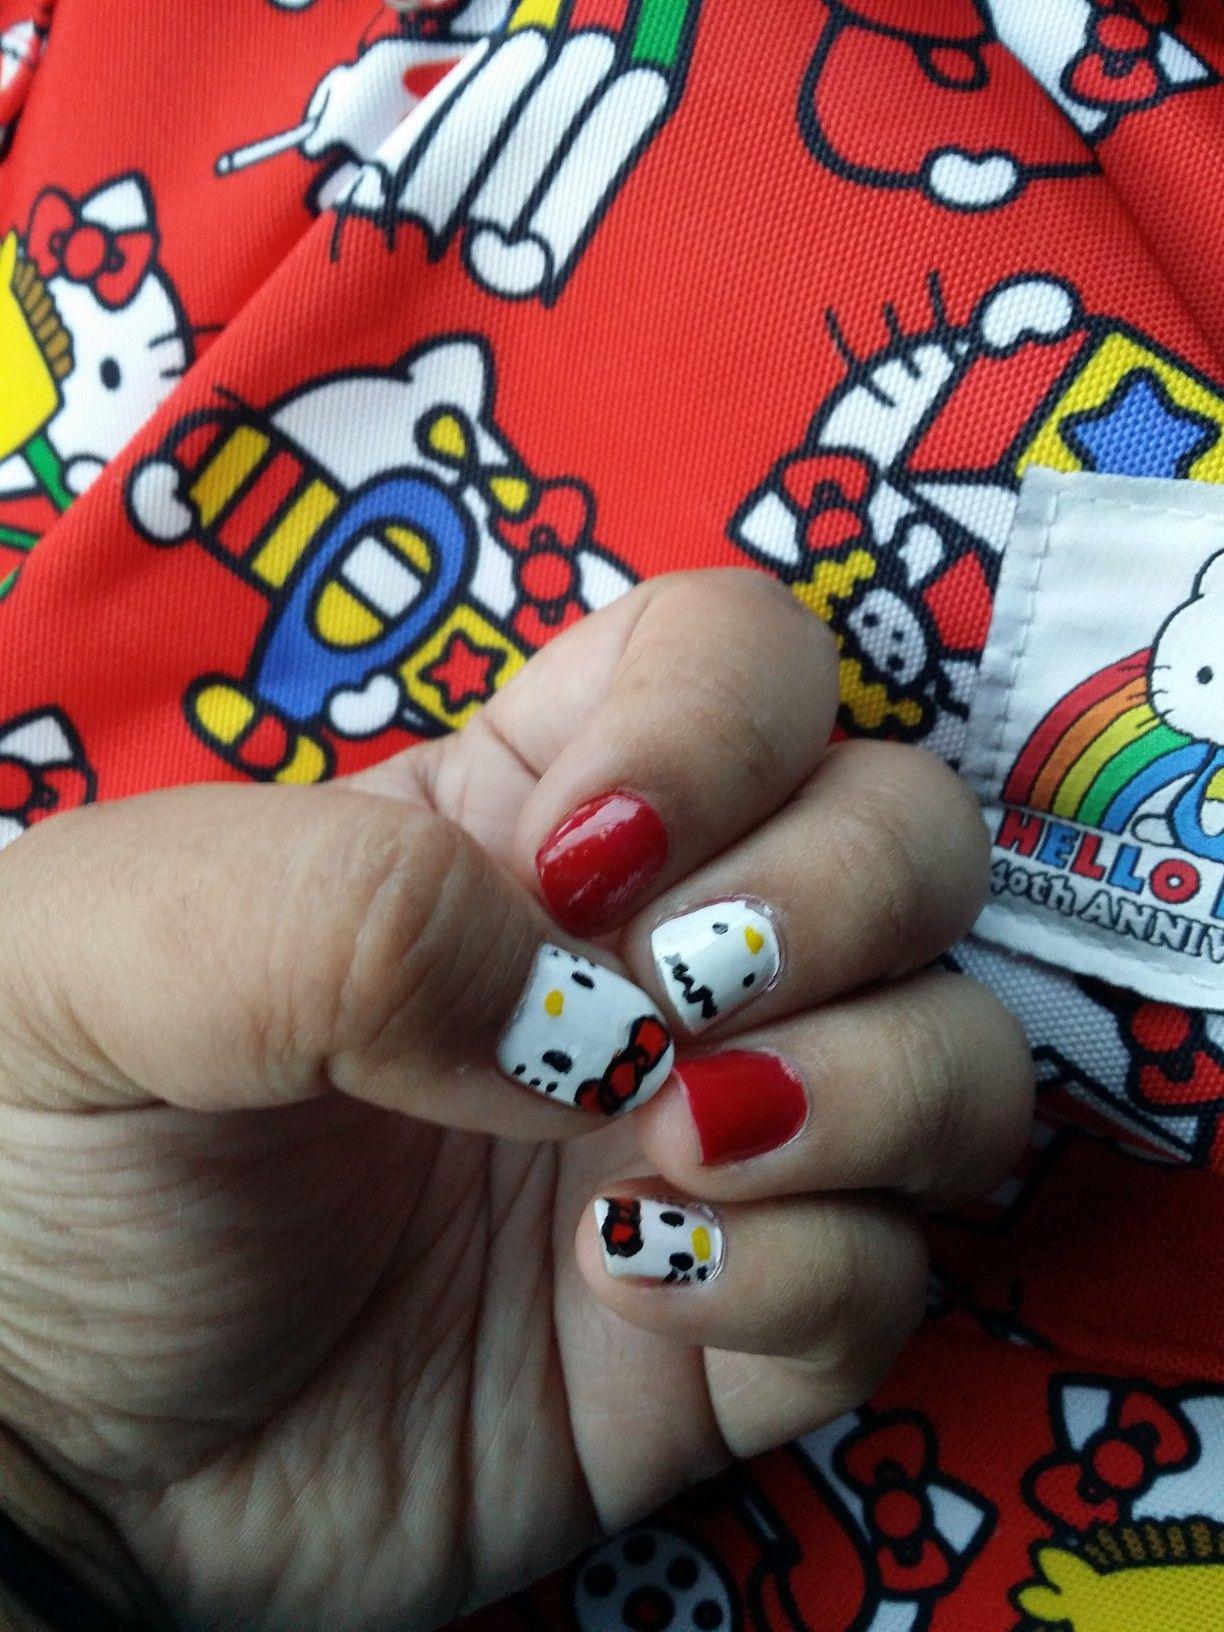 HK Con nail art class with まさこ こじま